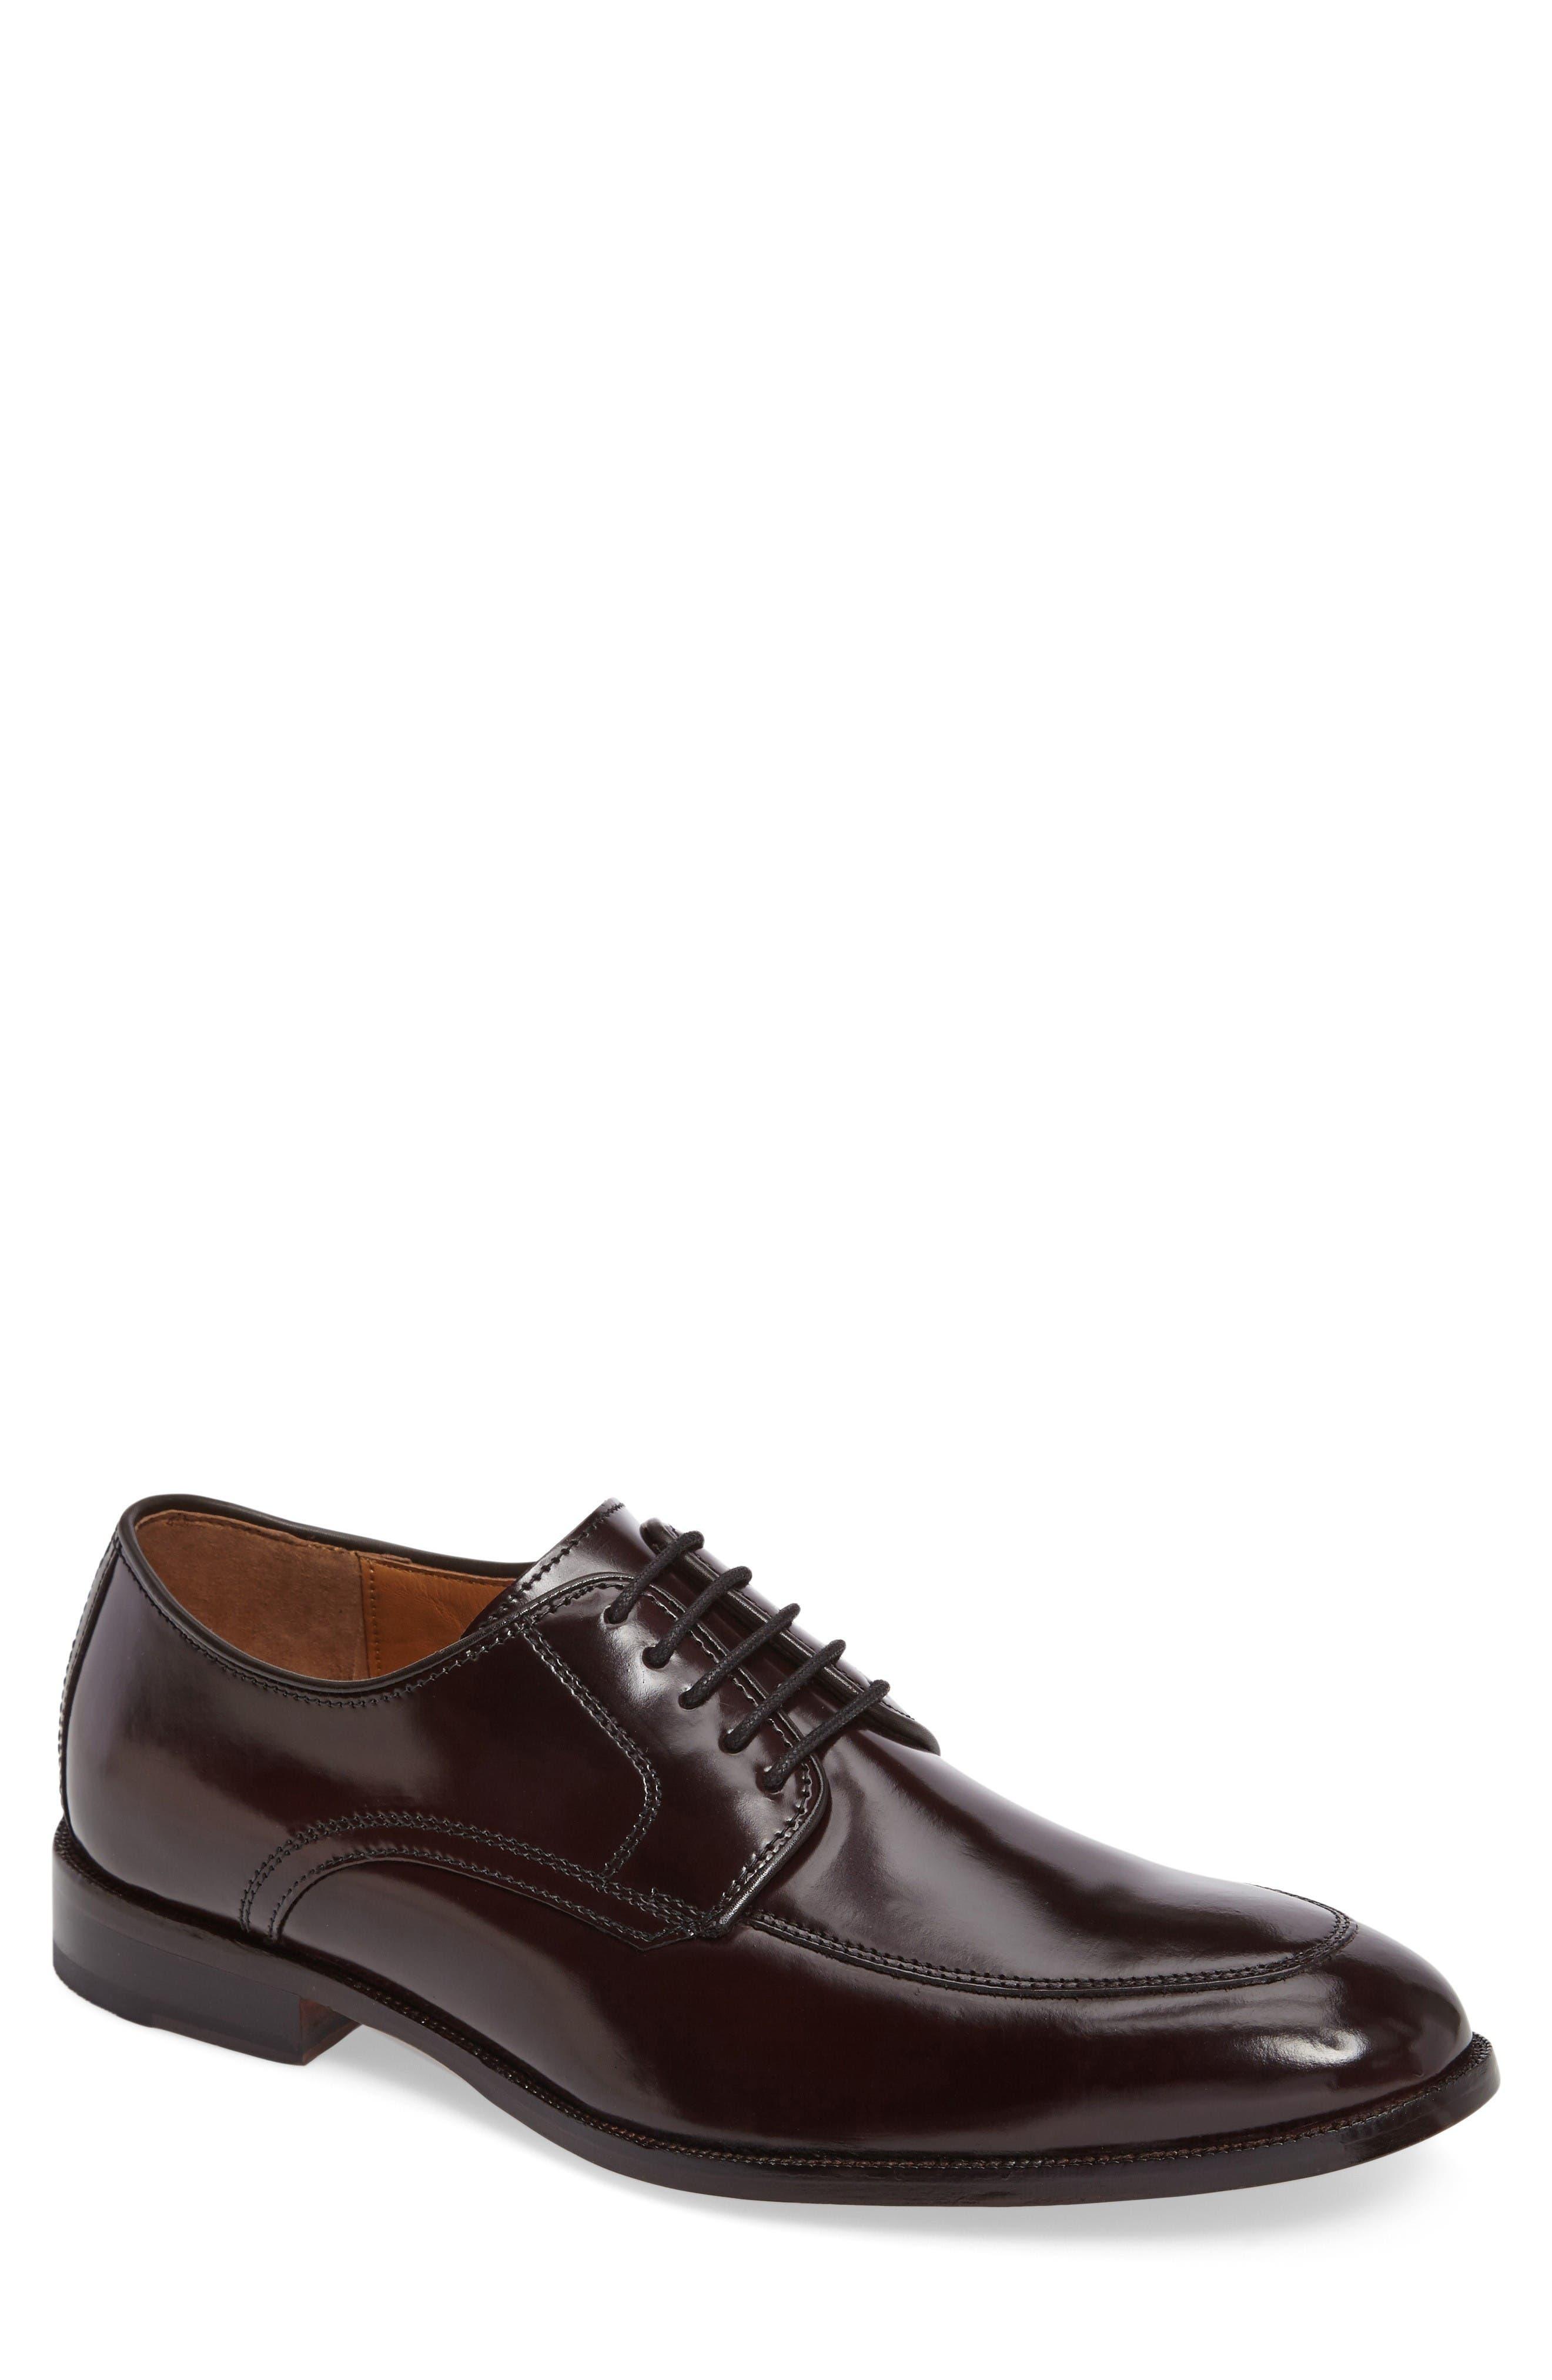 Bradford Apron-Toe Oxford,                             Main thumbnail 1, color,                             Burgundy Leather